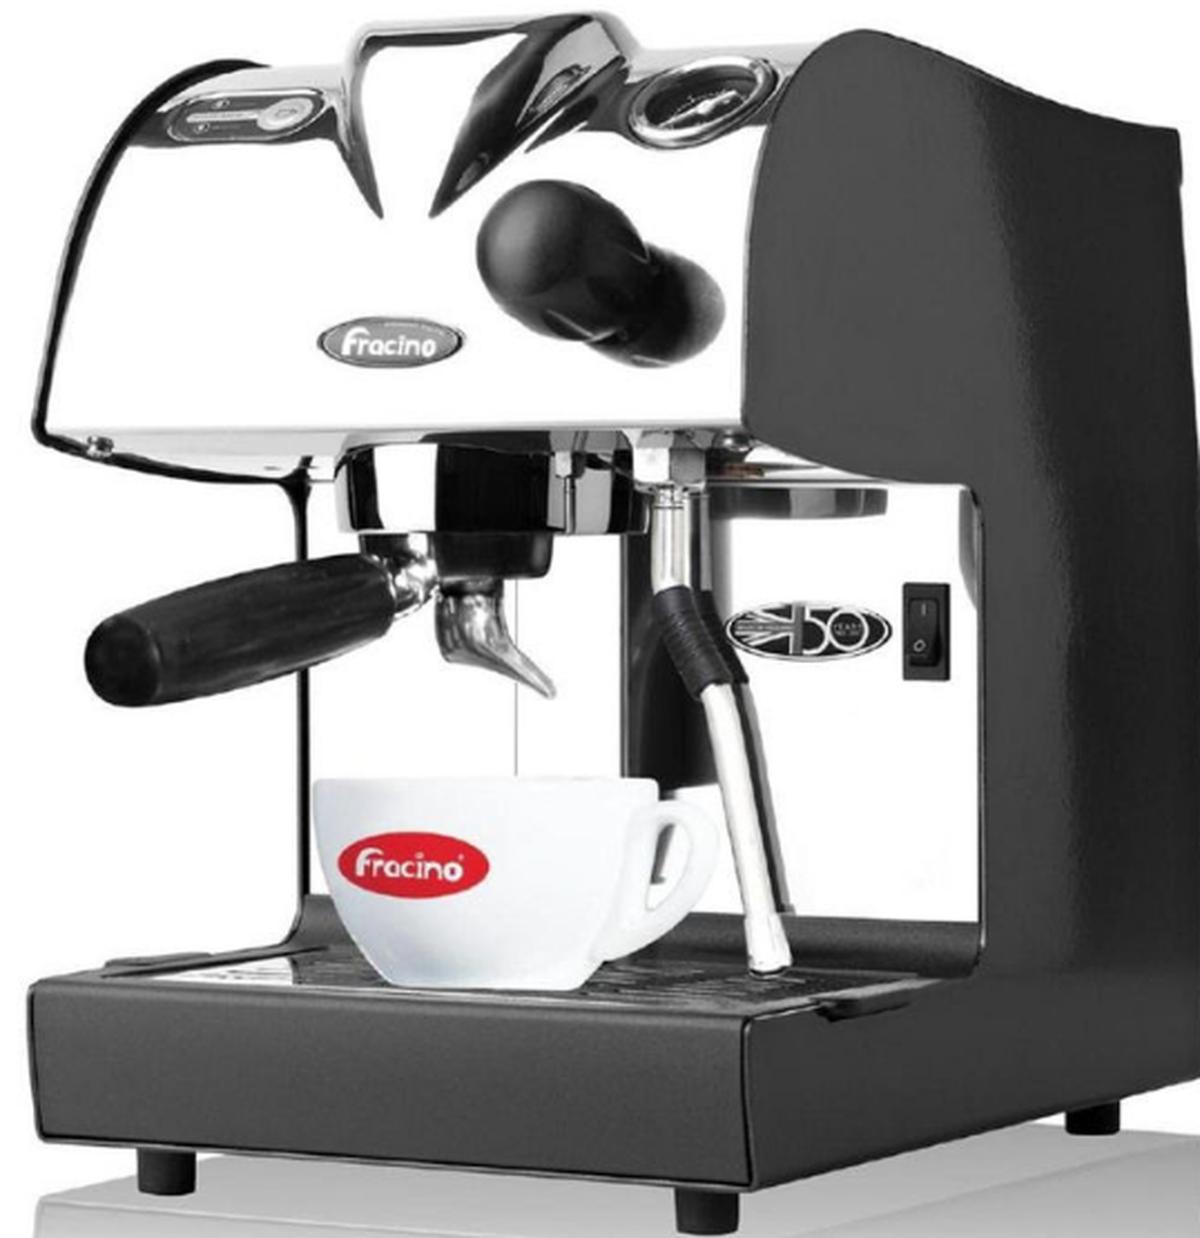 Fracino Piccino Coffee Machine And Coffee Grinder London E1